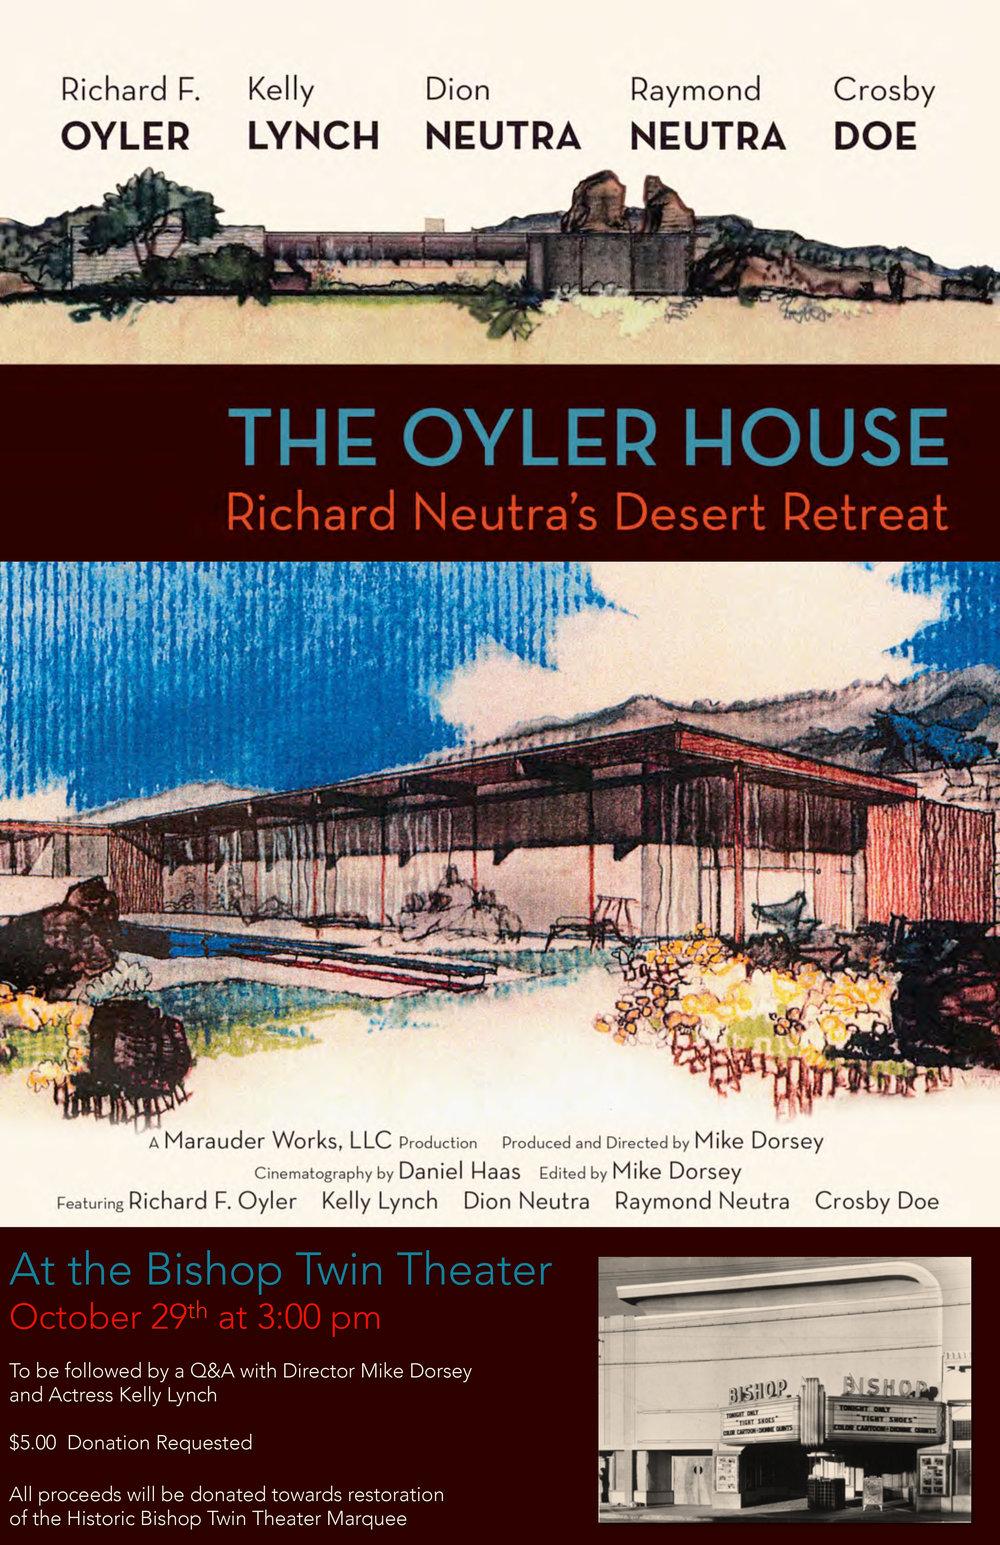 OylerHousePoster.jpg